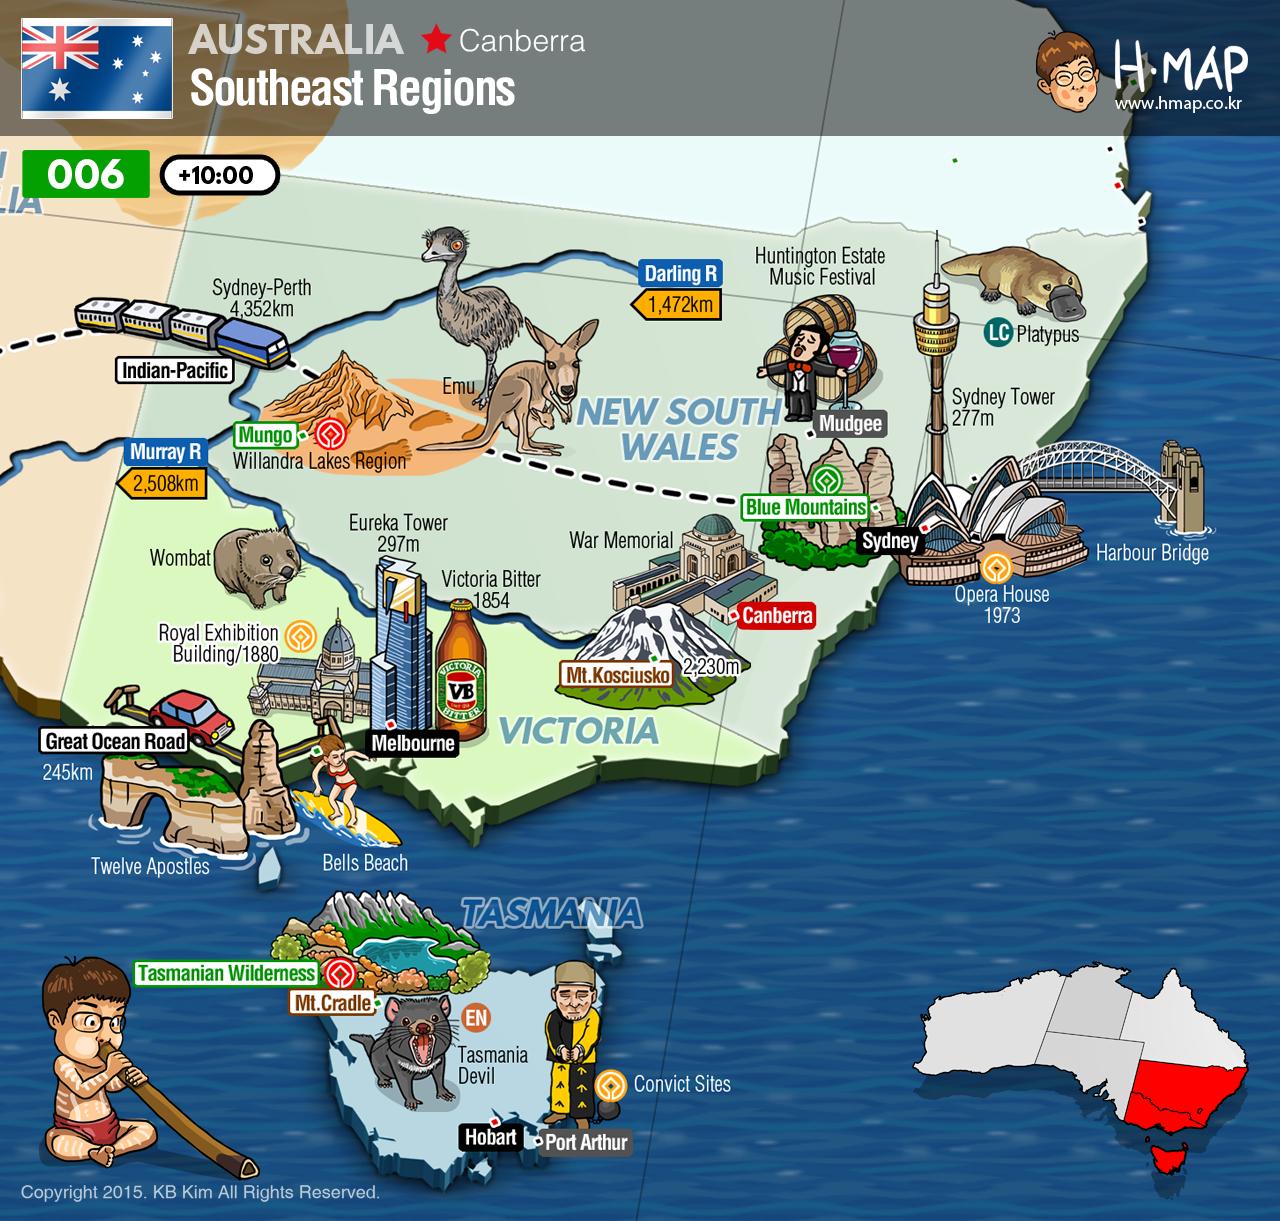 Australia Map Southeast Regions New South Wales Victoria - South wales australia map